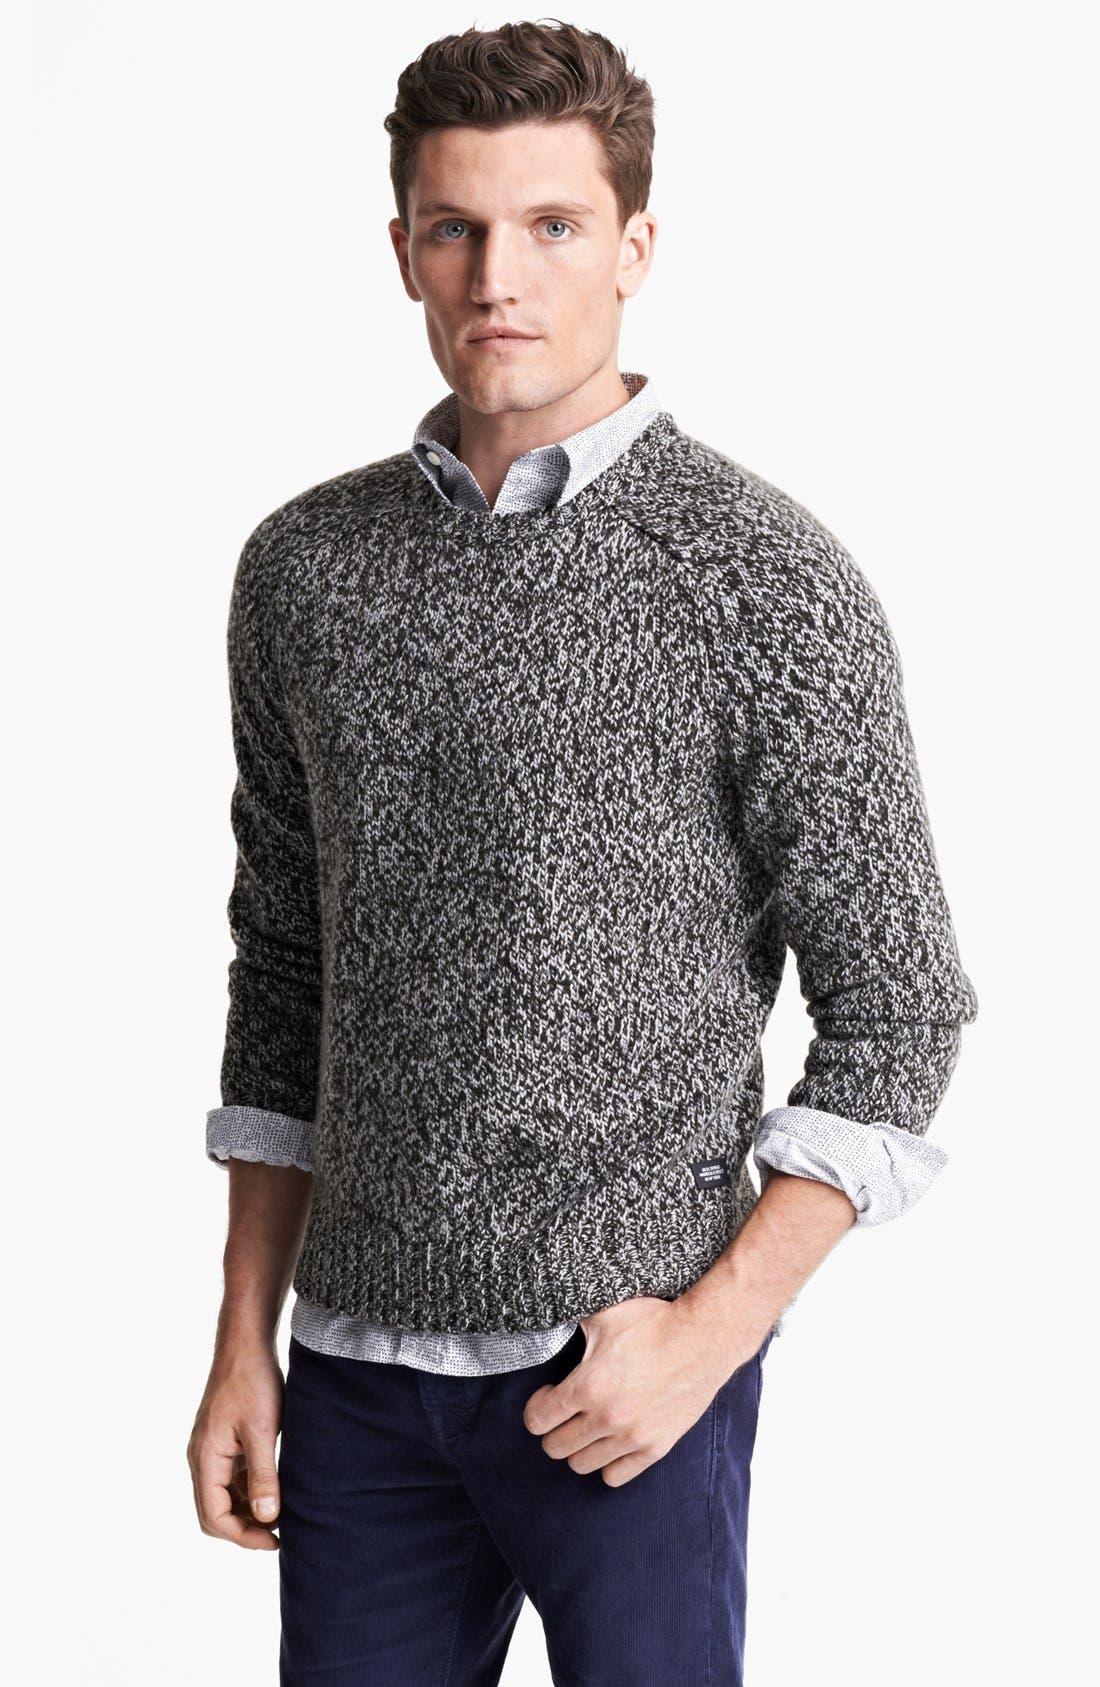 Alternate Image 1 Selected - Jack Spade 'Cameron' Marled Crewneck Sweater